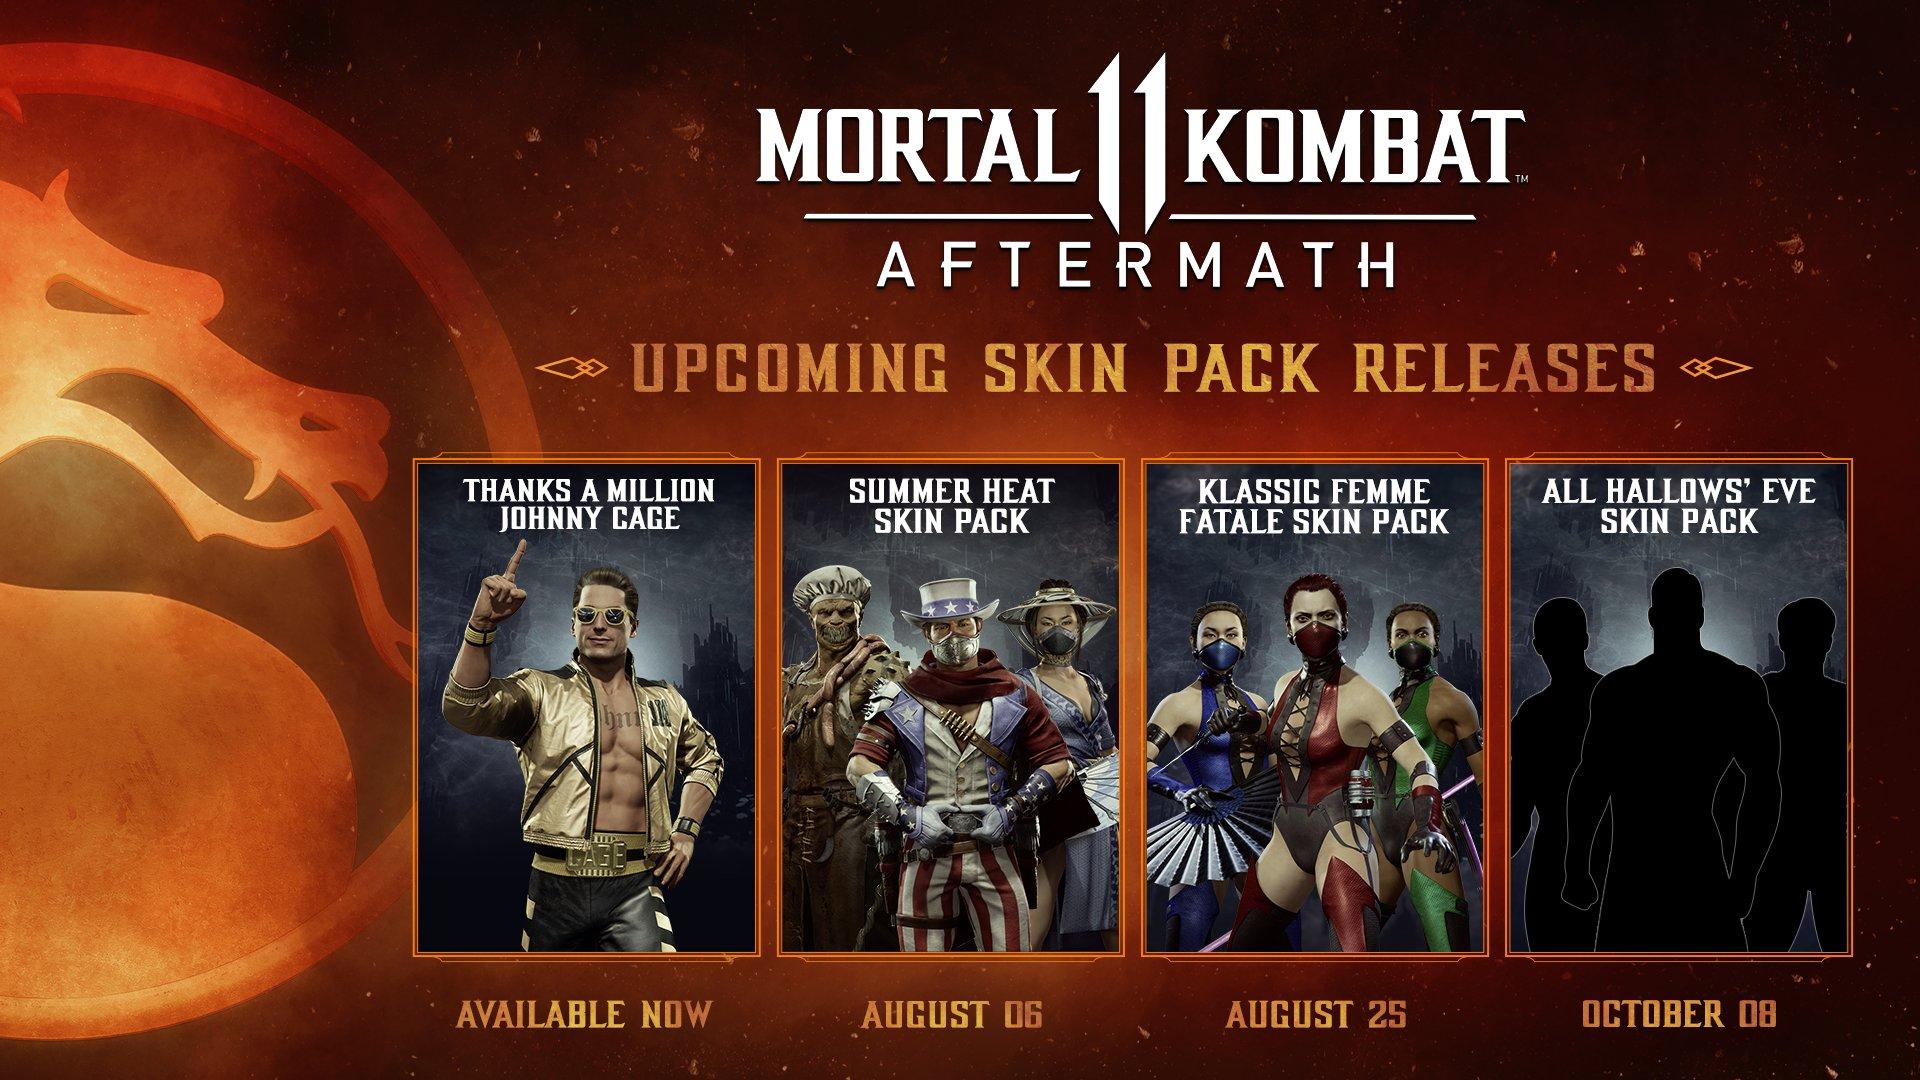 Les différents skin pack de Mortal Kombat 11 Aftermath